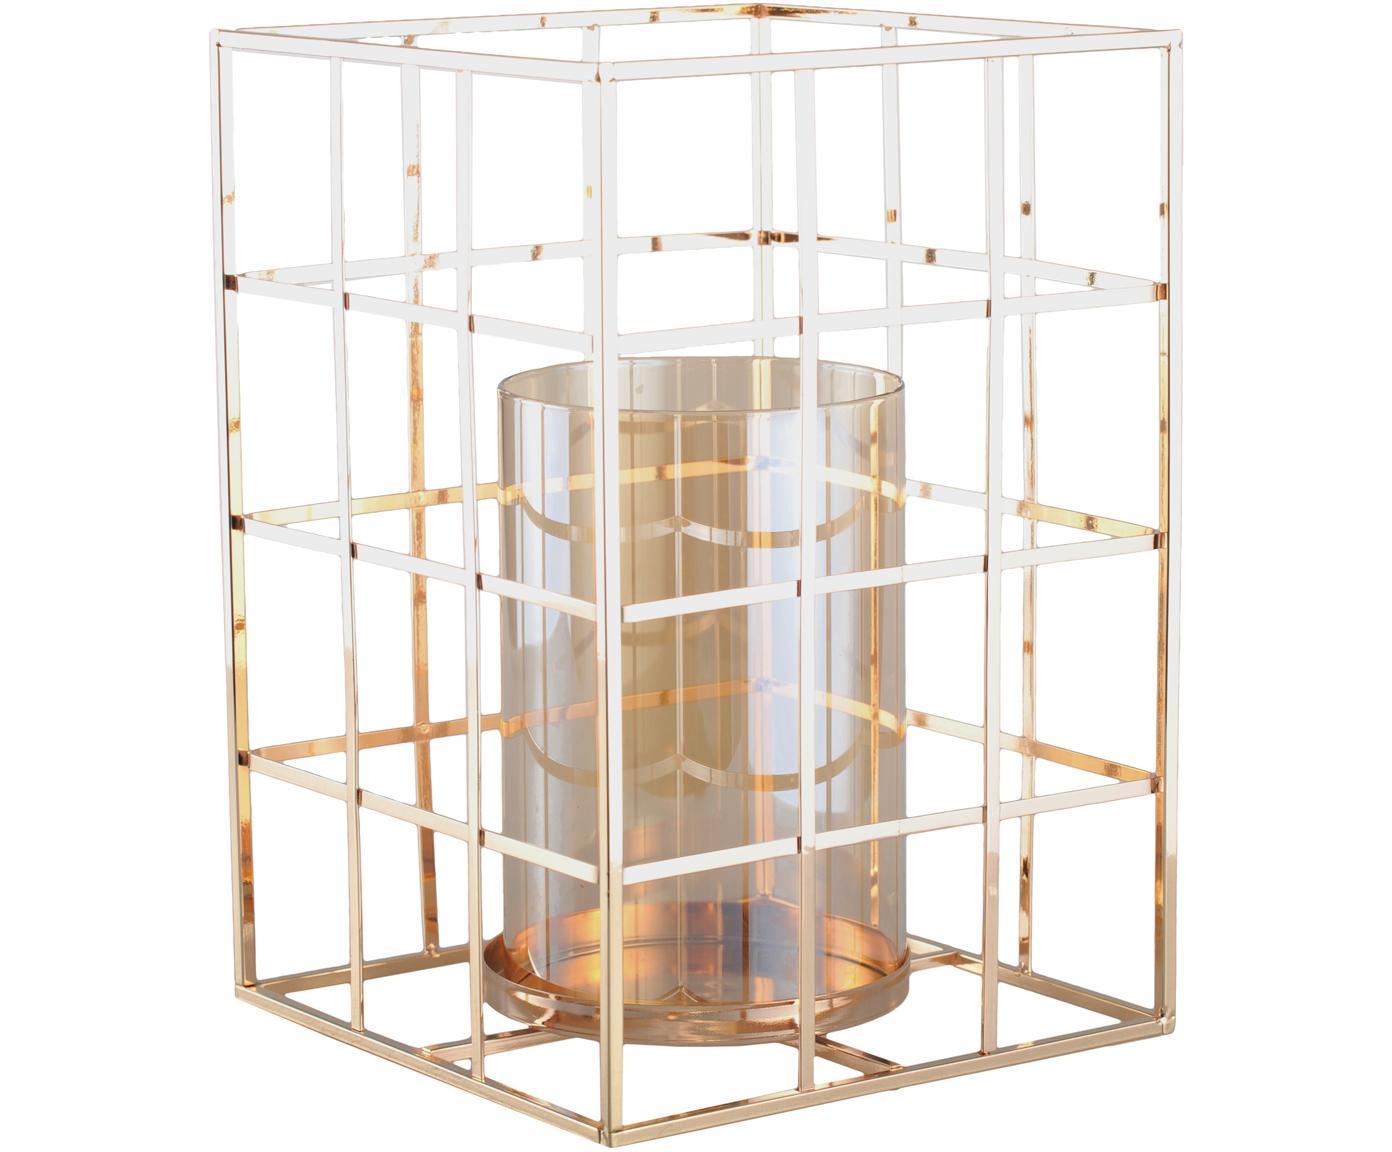 Portacandela Kubic, Struttura: metallo, Portacandela: vetro, Dorato, Larg. 17 x Alt. 24 cm